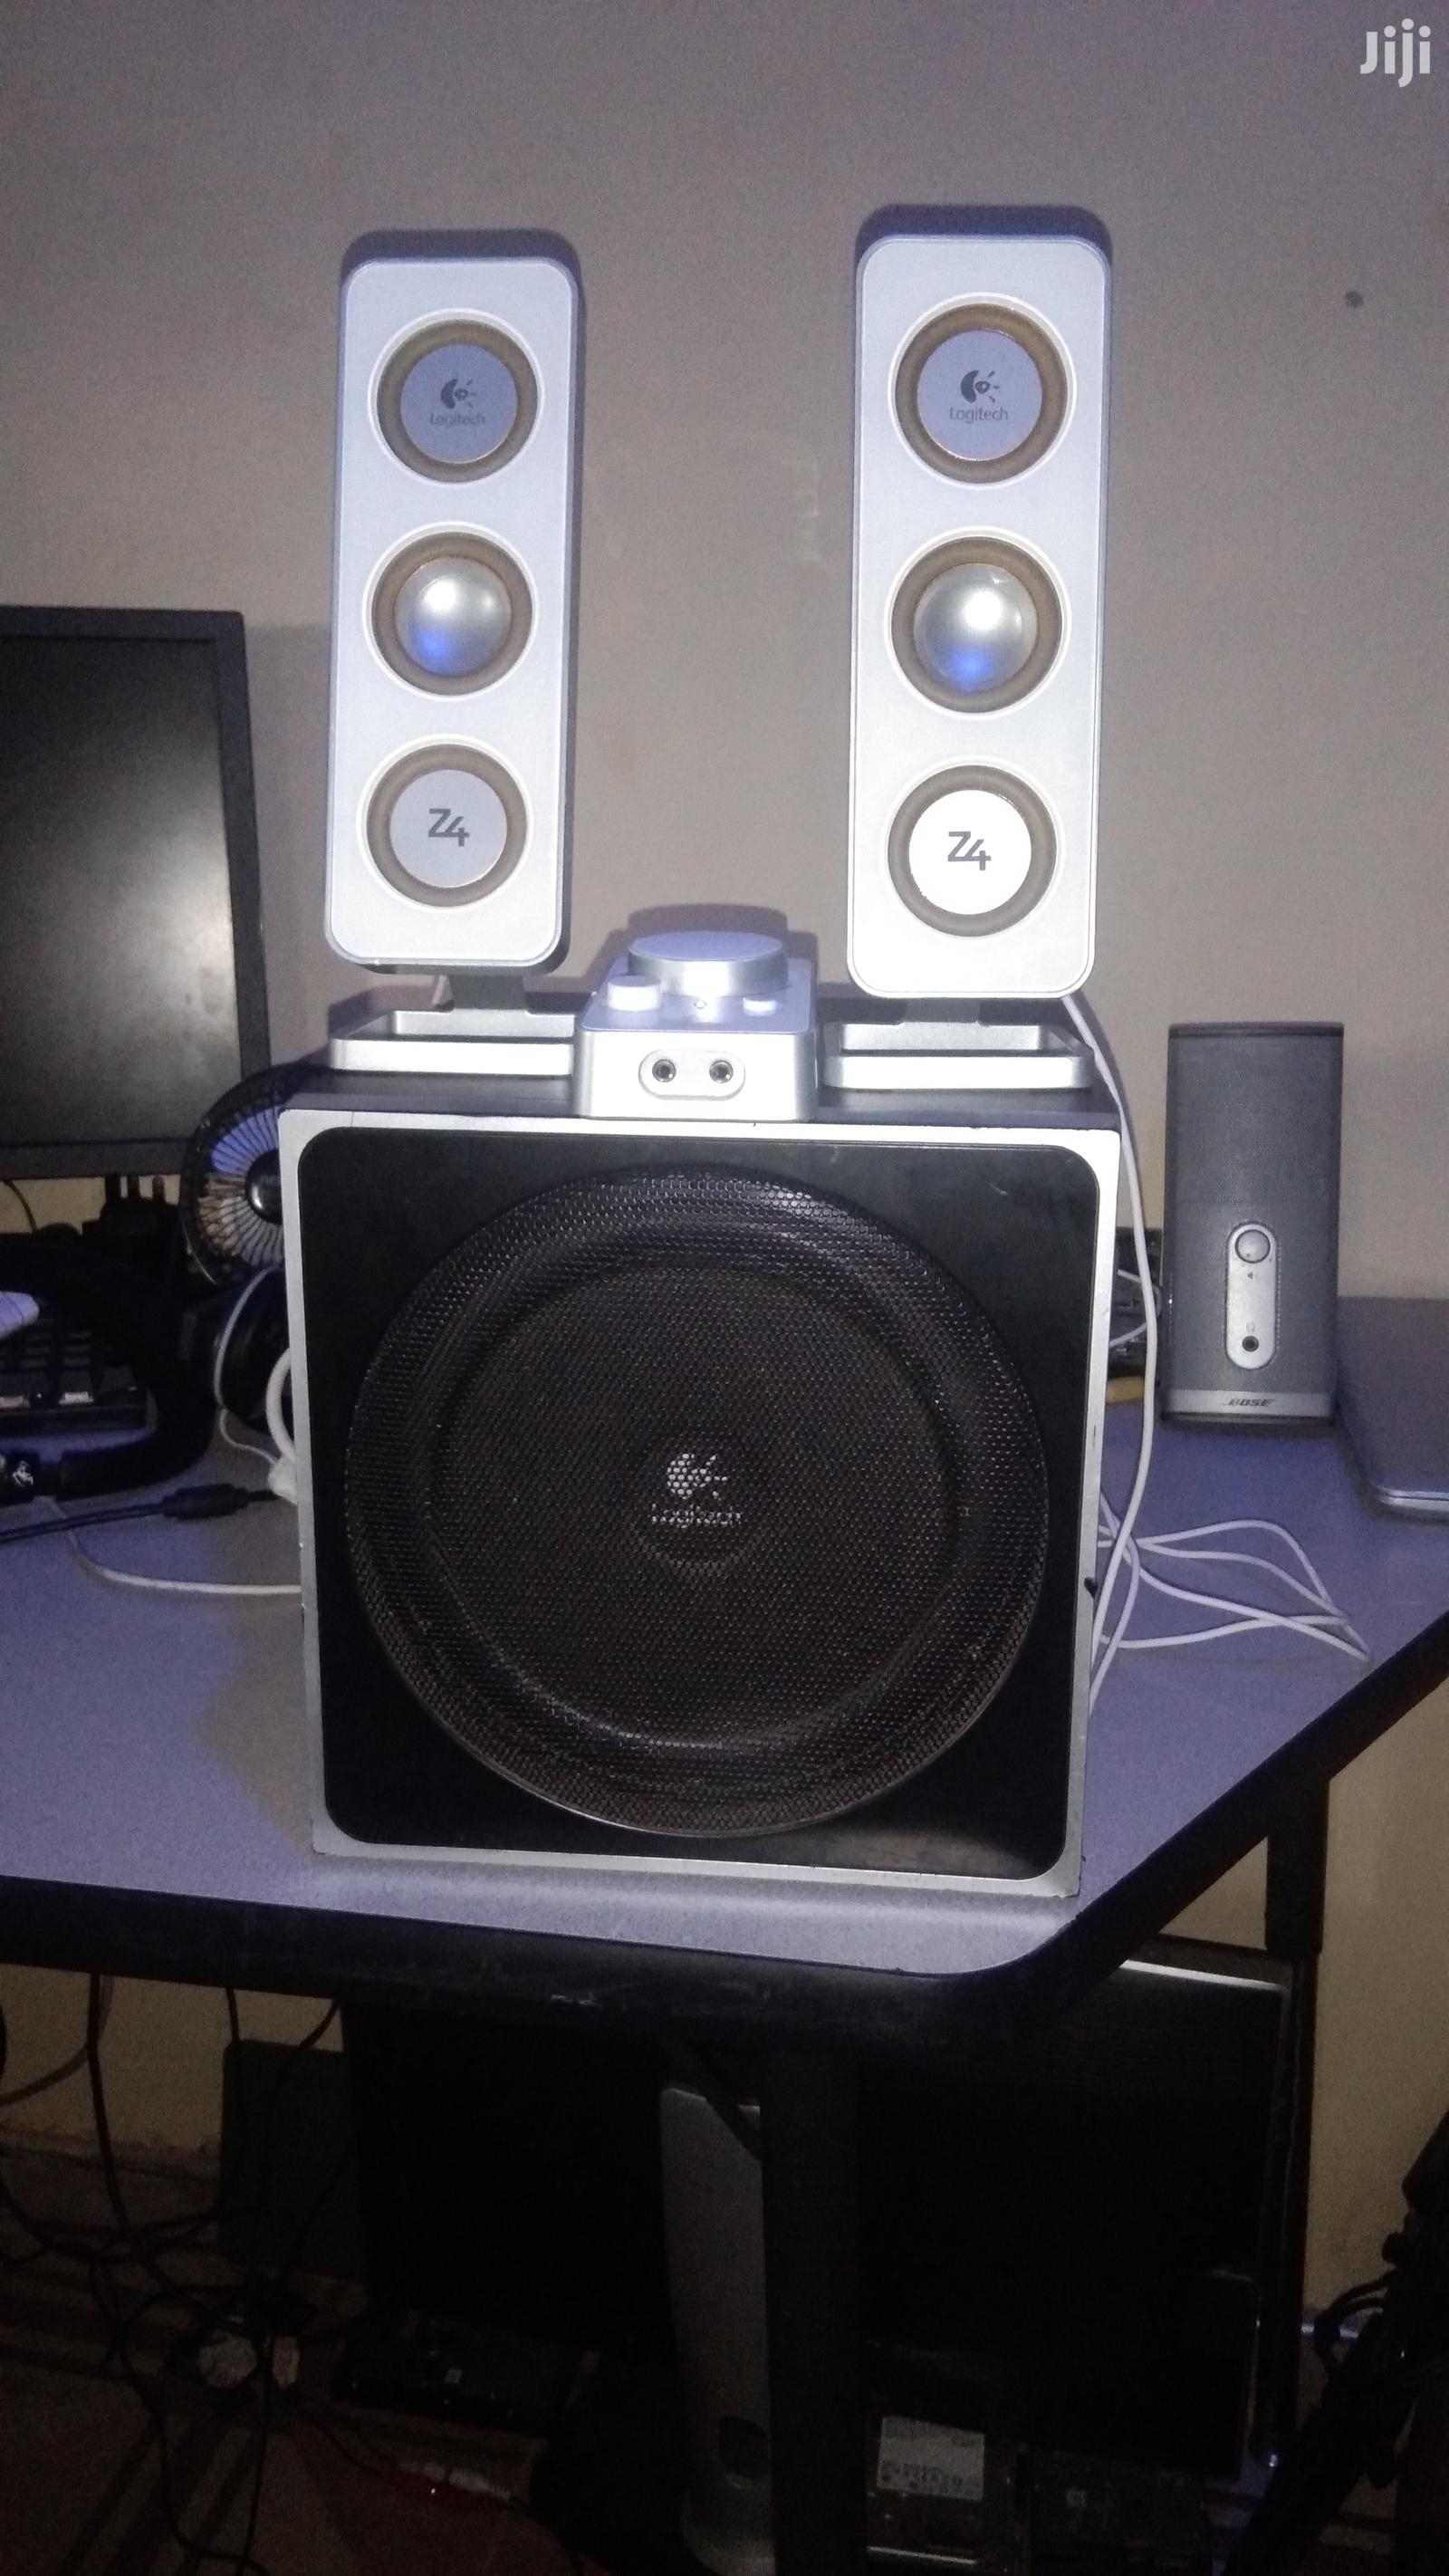 Archive: Logitech Z4 Speaker System - Black